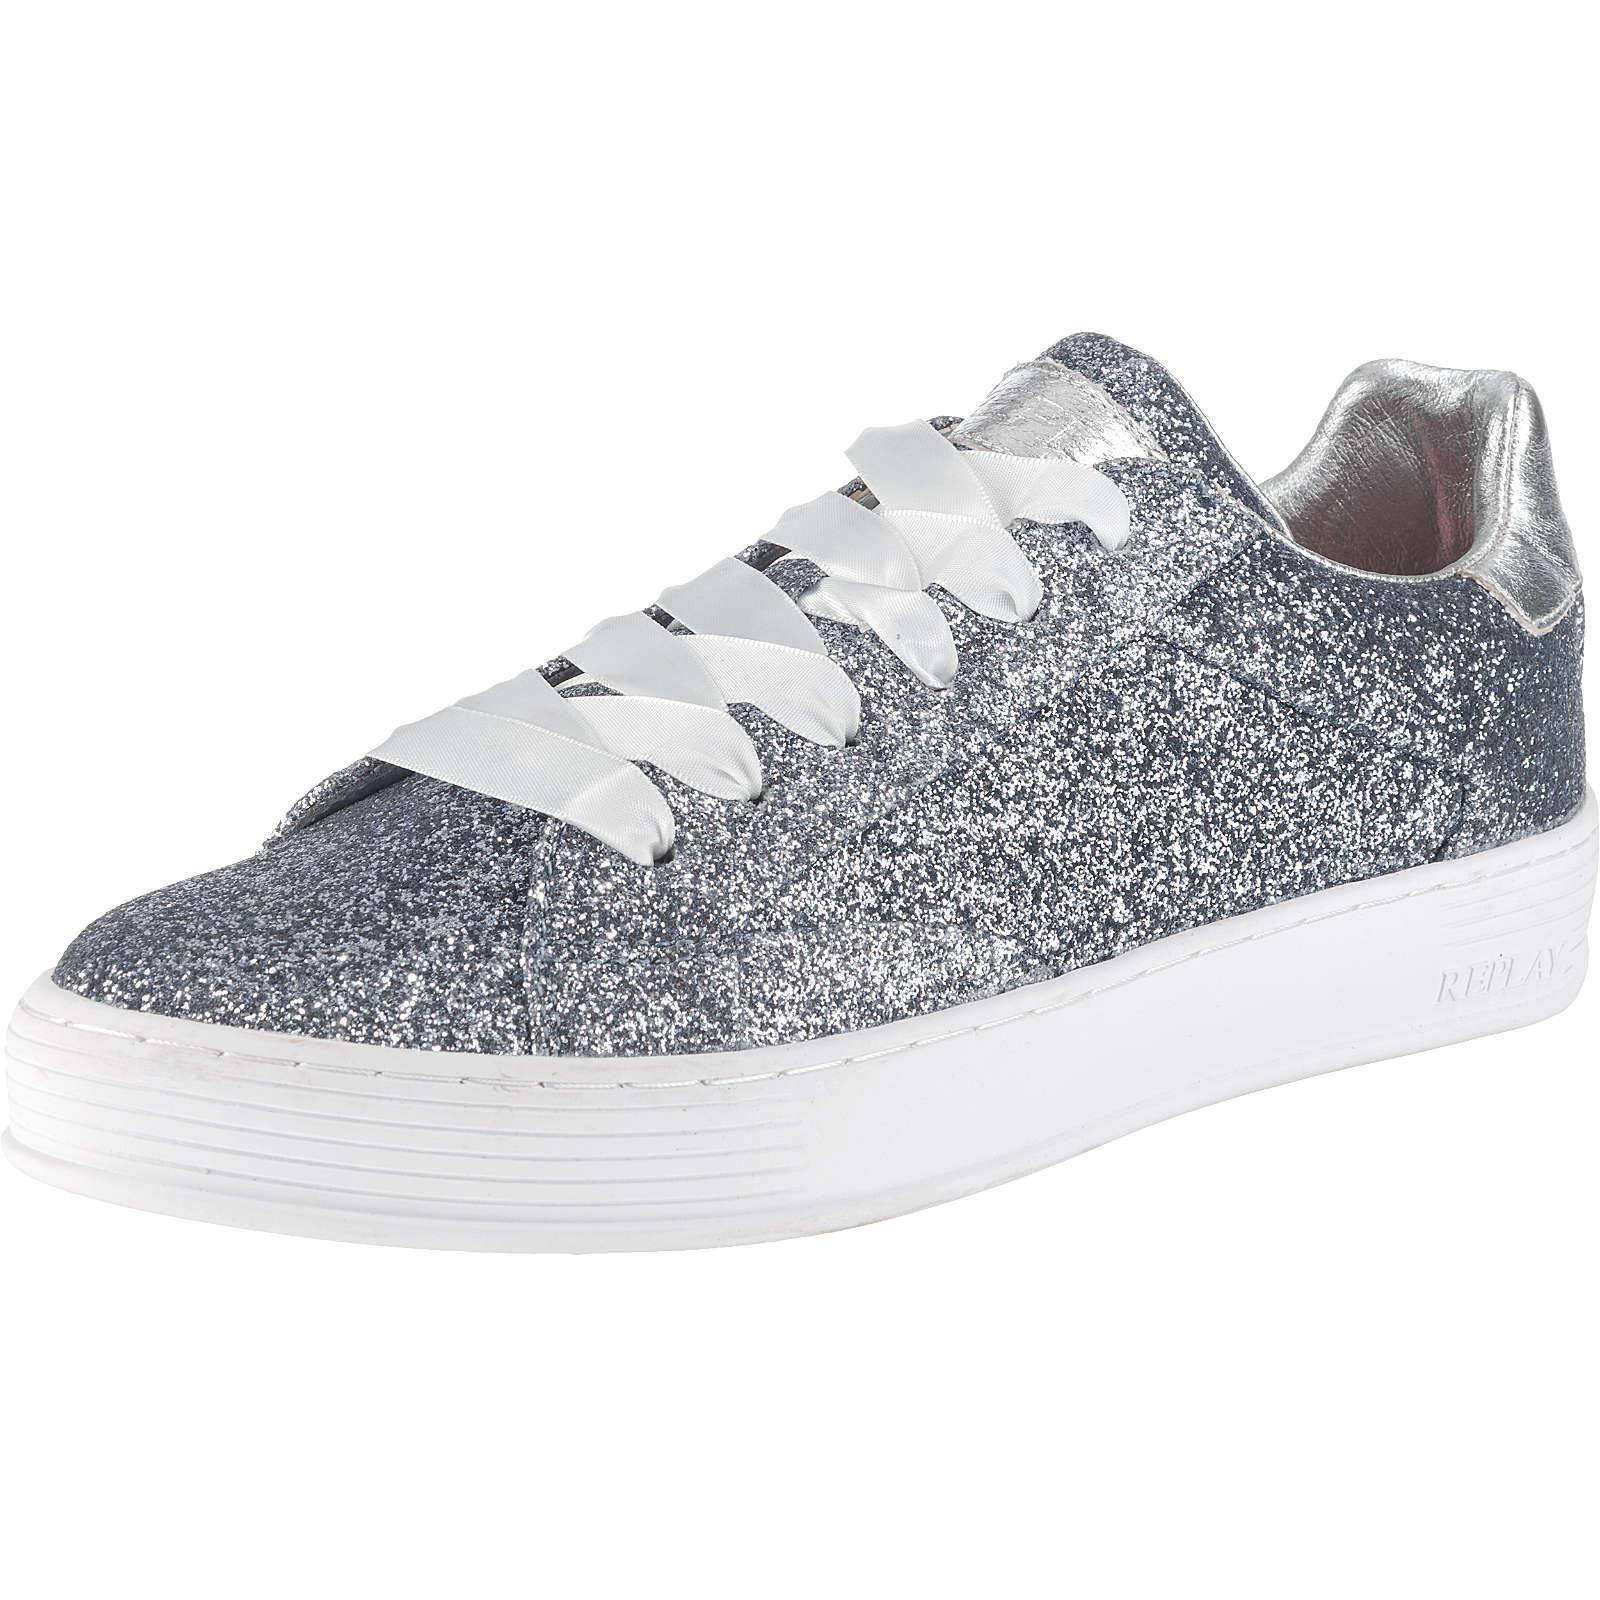 REPLAY Welh Sneakers Low grau Damen Gr. 36